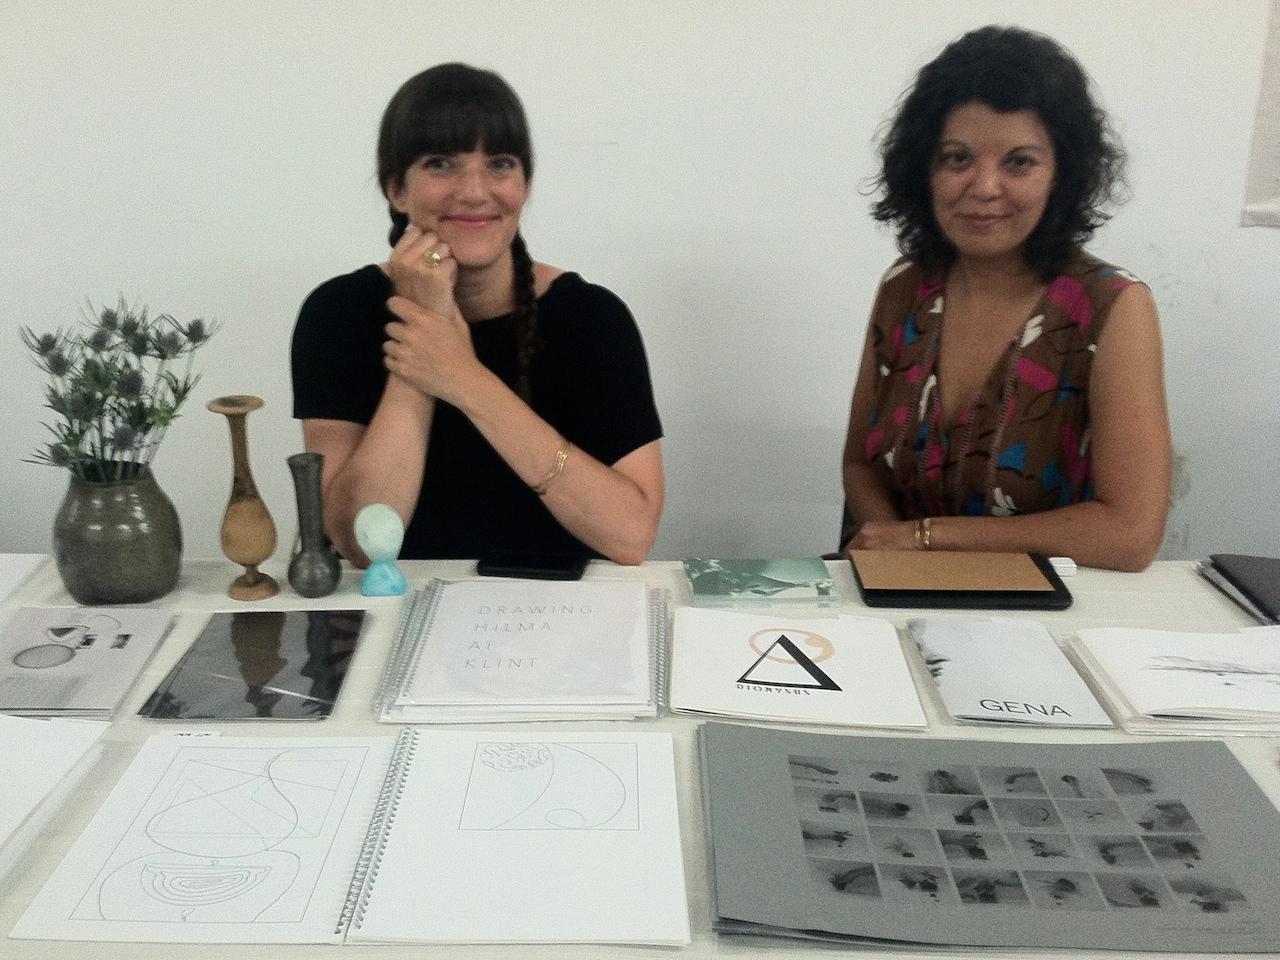 Denise Schatz and Claudia Peña Salinas of Miniature Garden